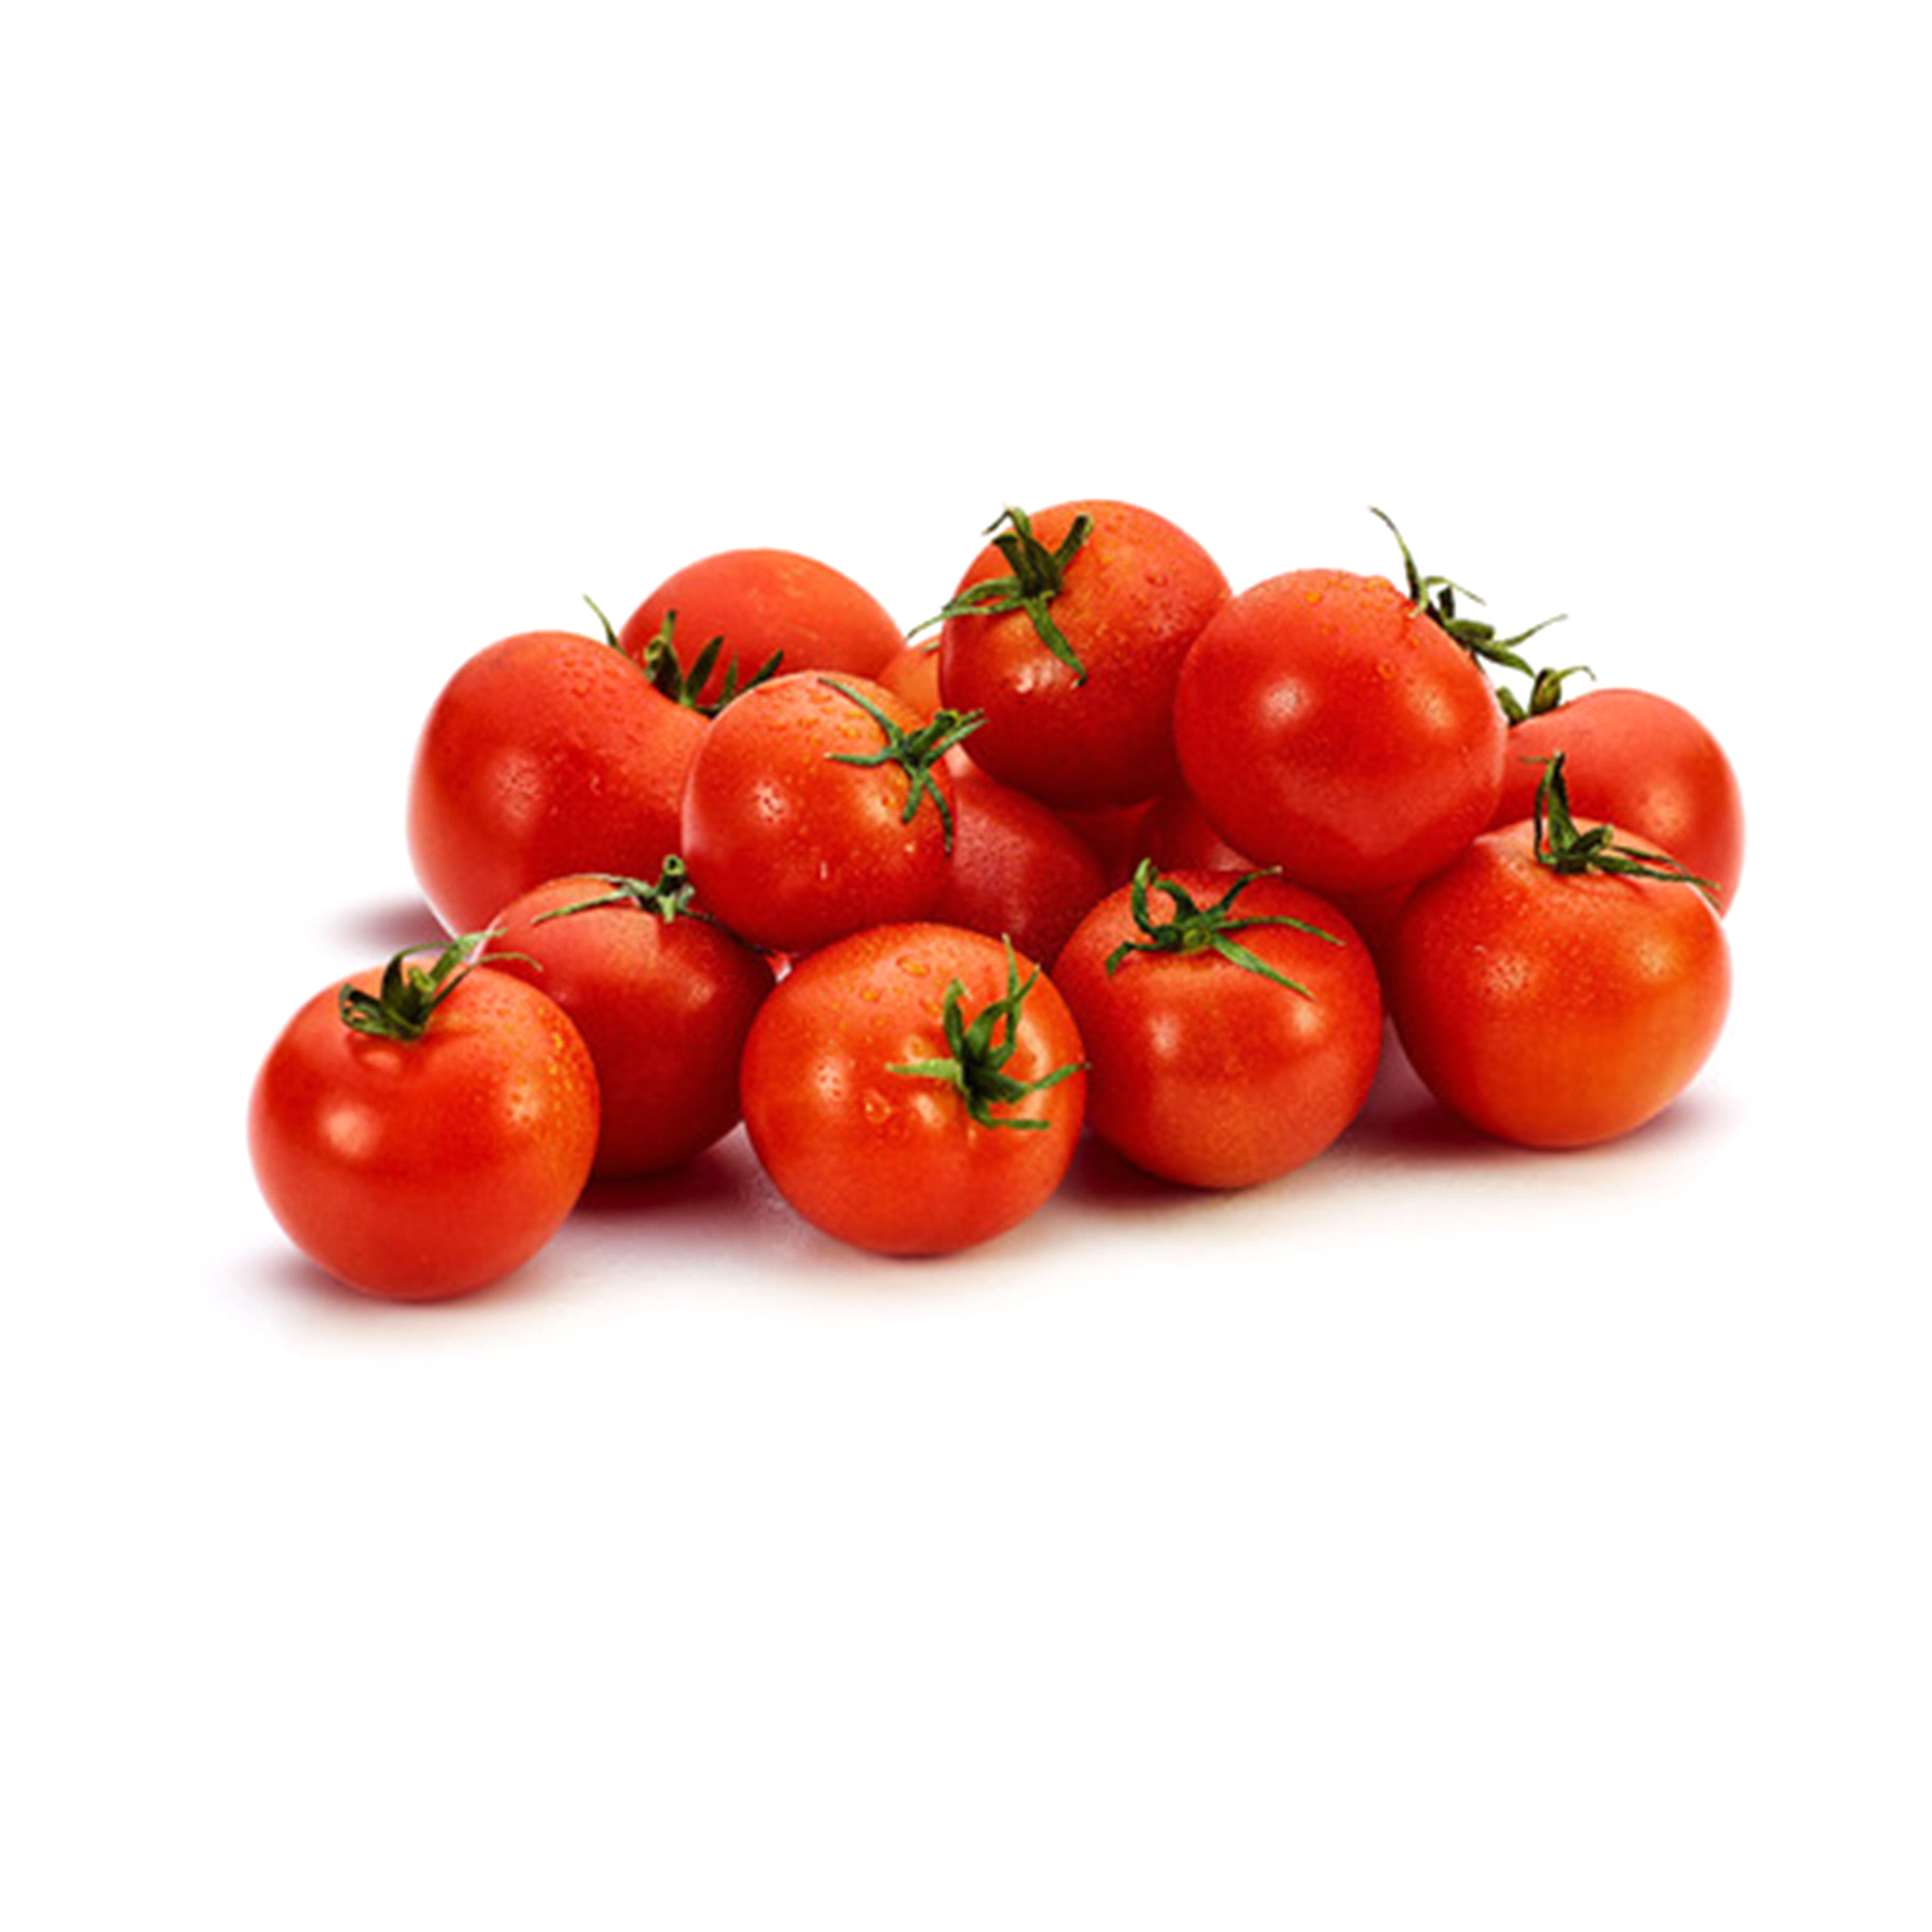 Campari Tomatoes 16 oz   Meijer.com